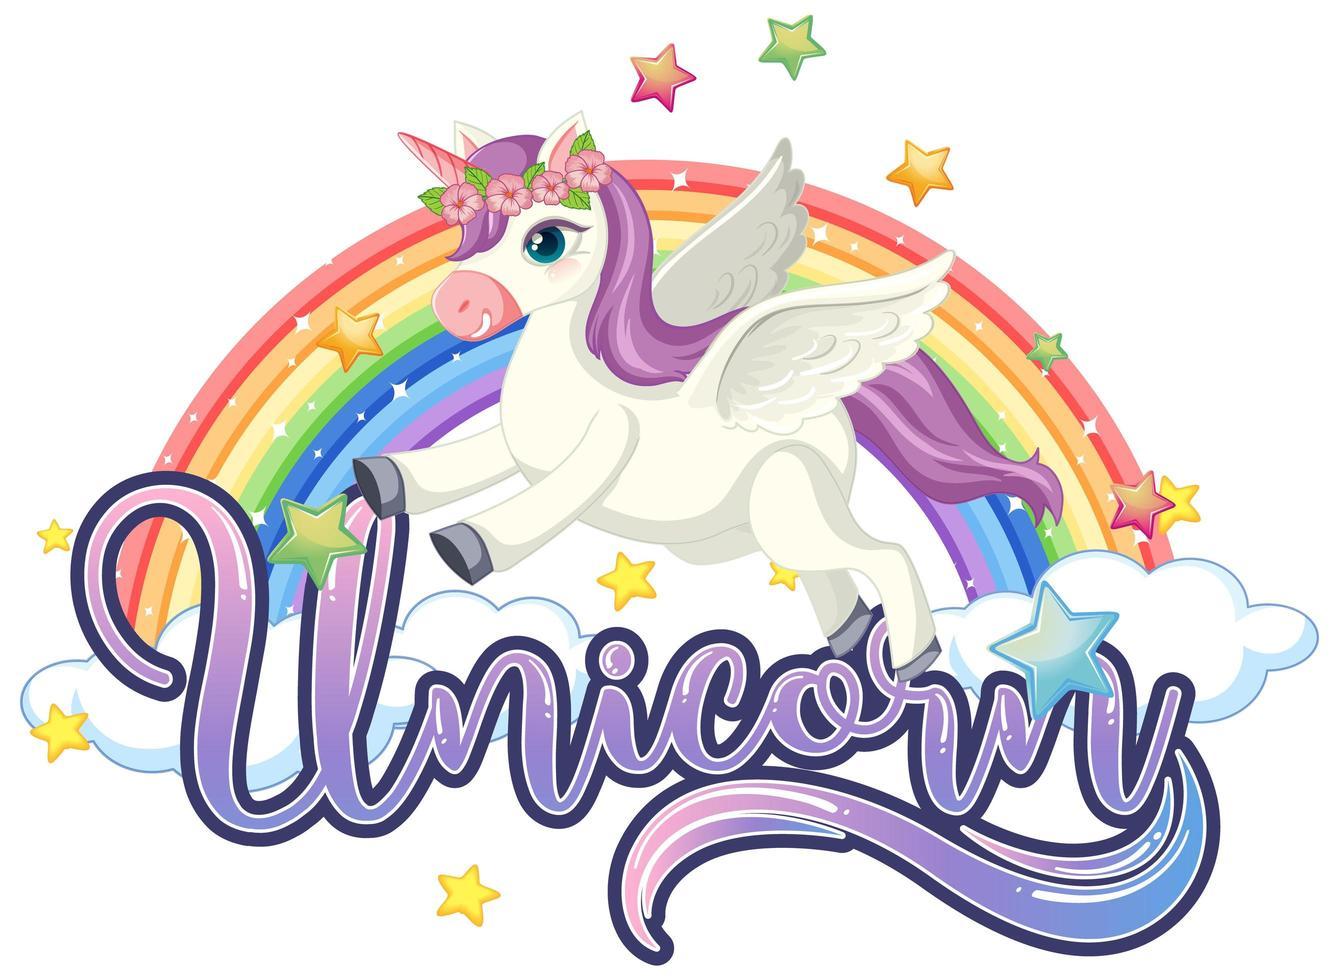 lindo unicornio con letrero de unicornio y arco iris vector